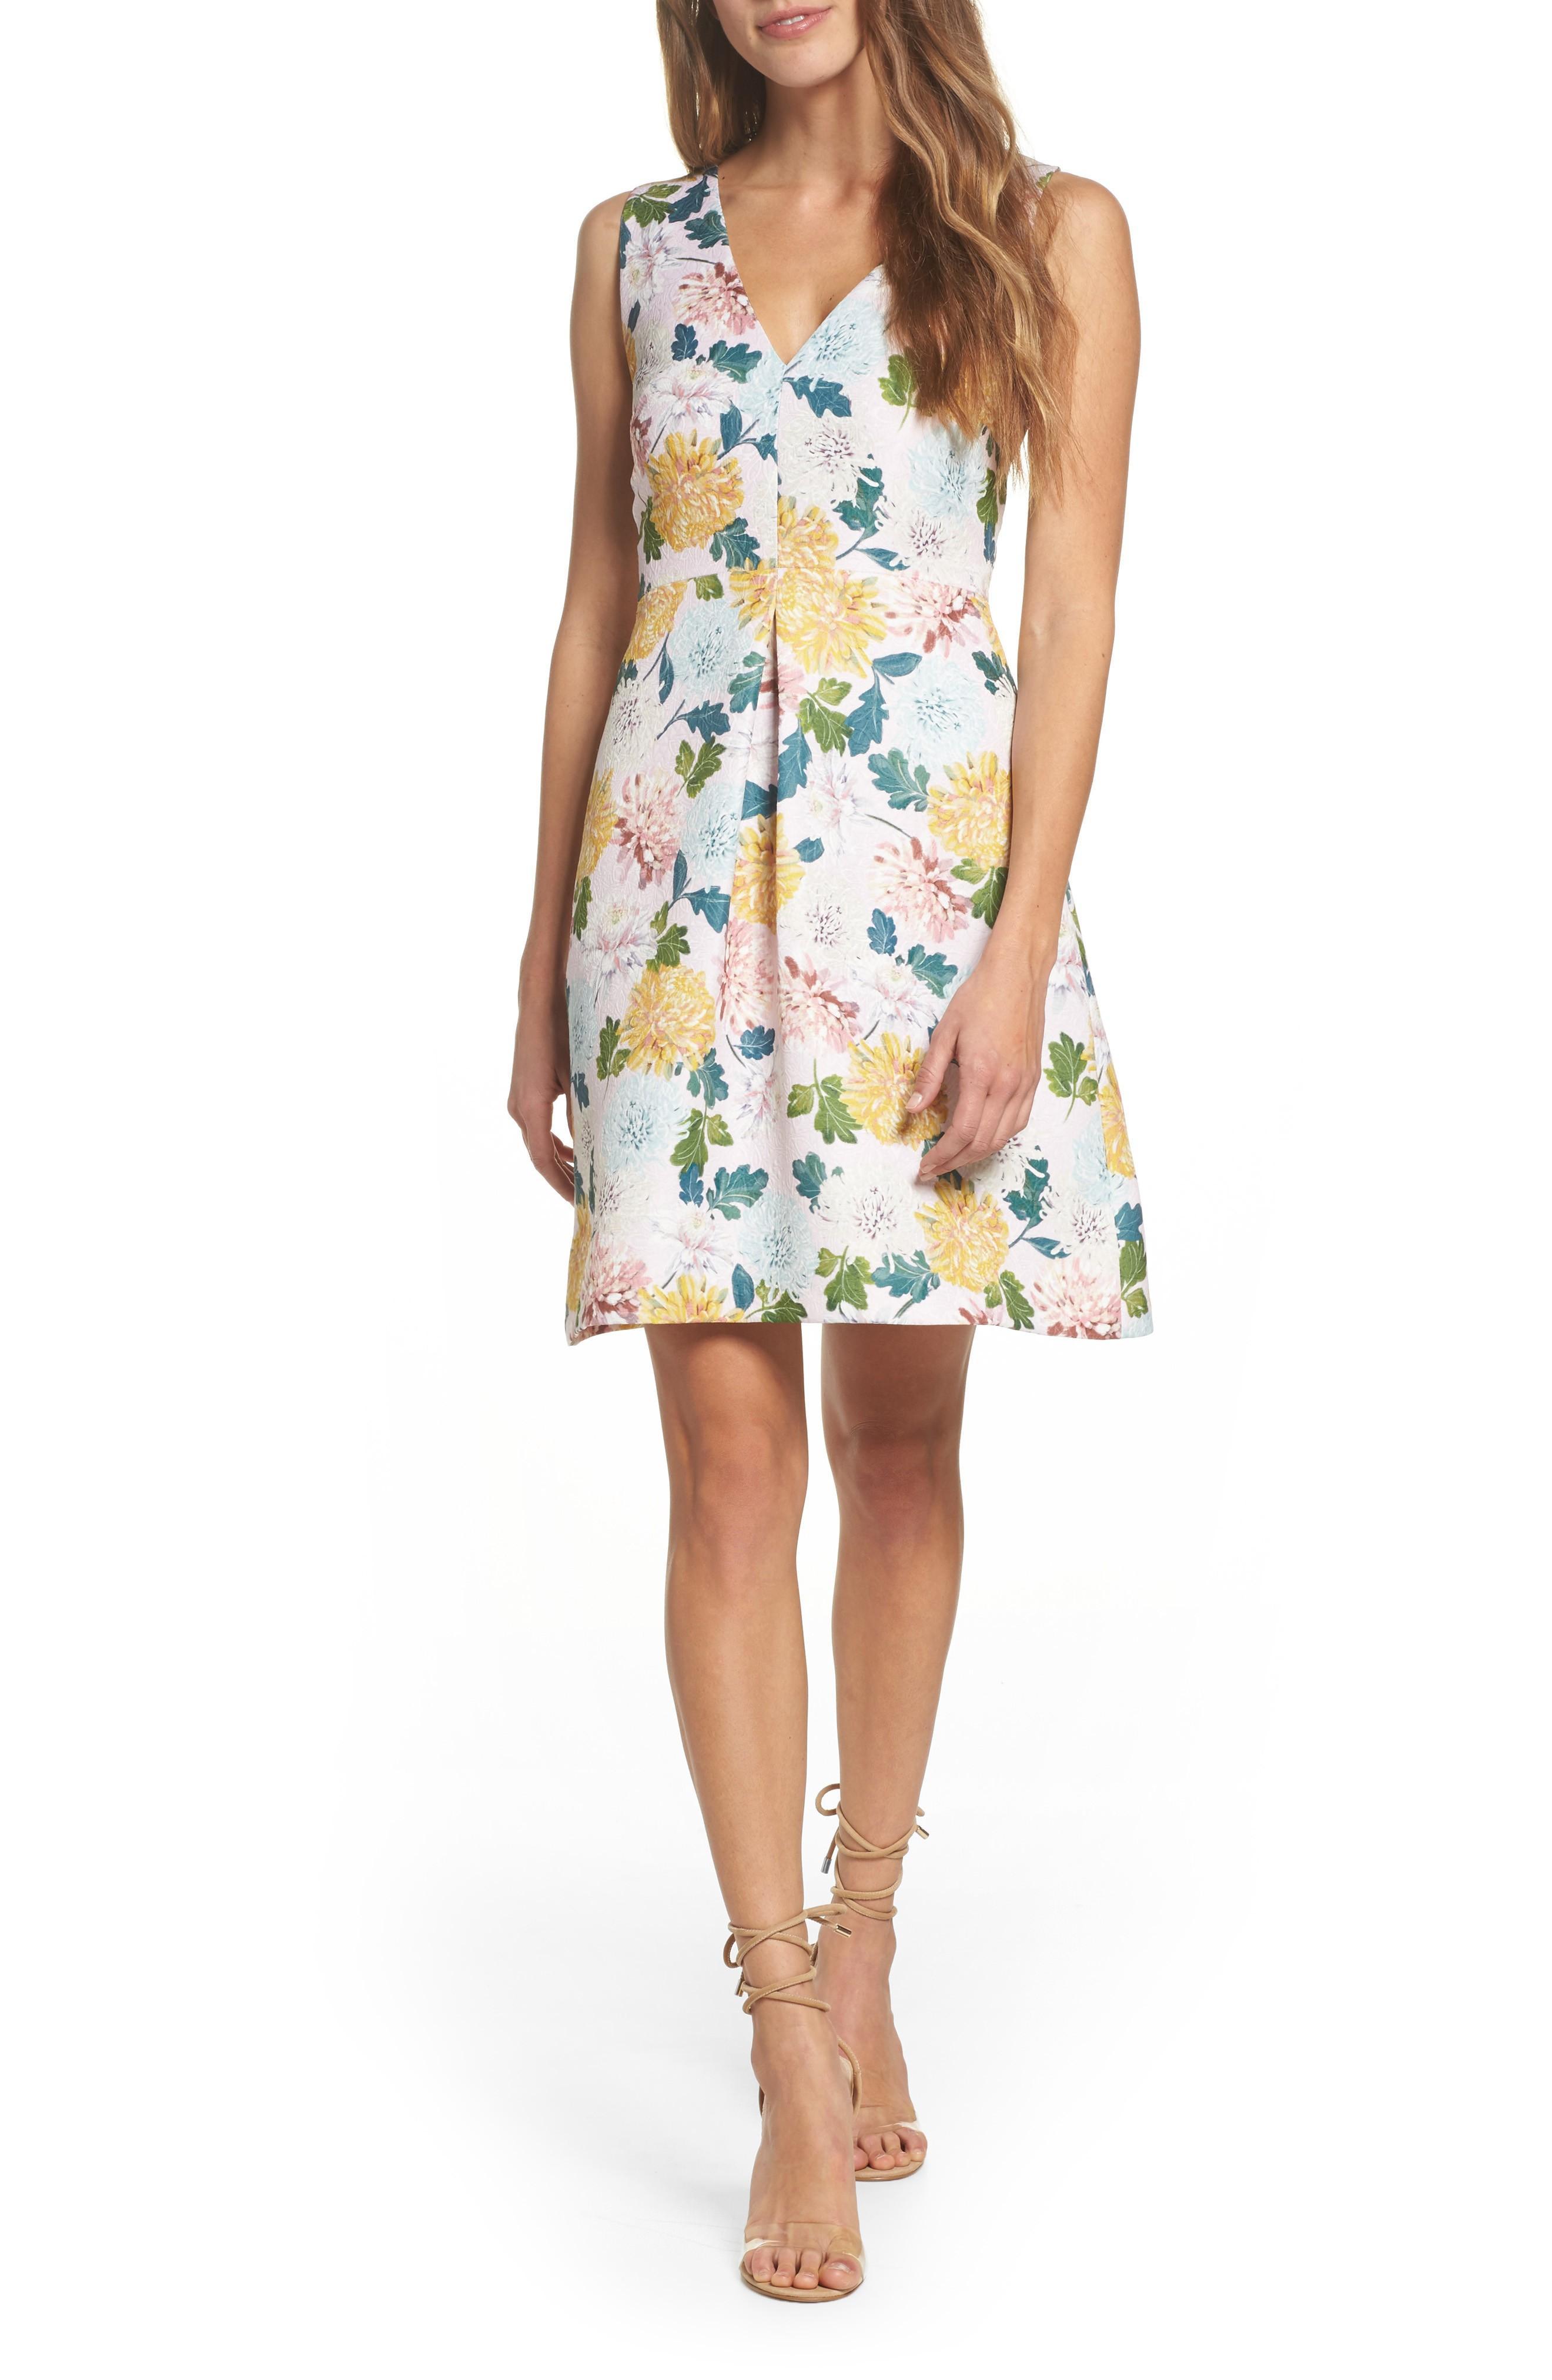 Sam Edelman Jacquard A-line Dress In Pink Multi